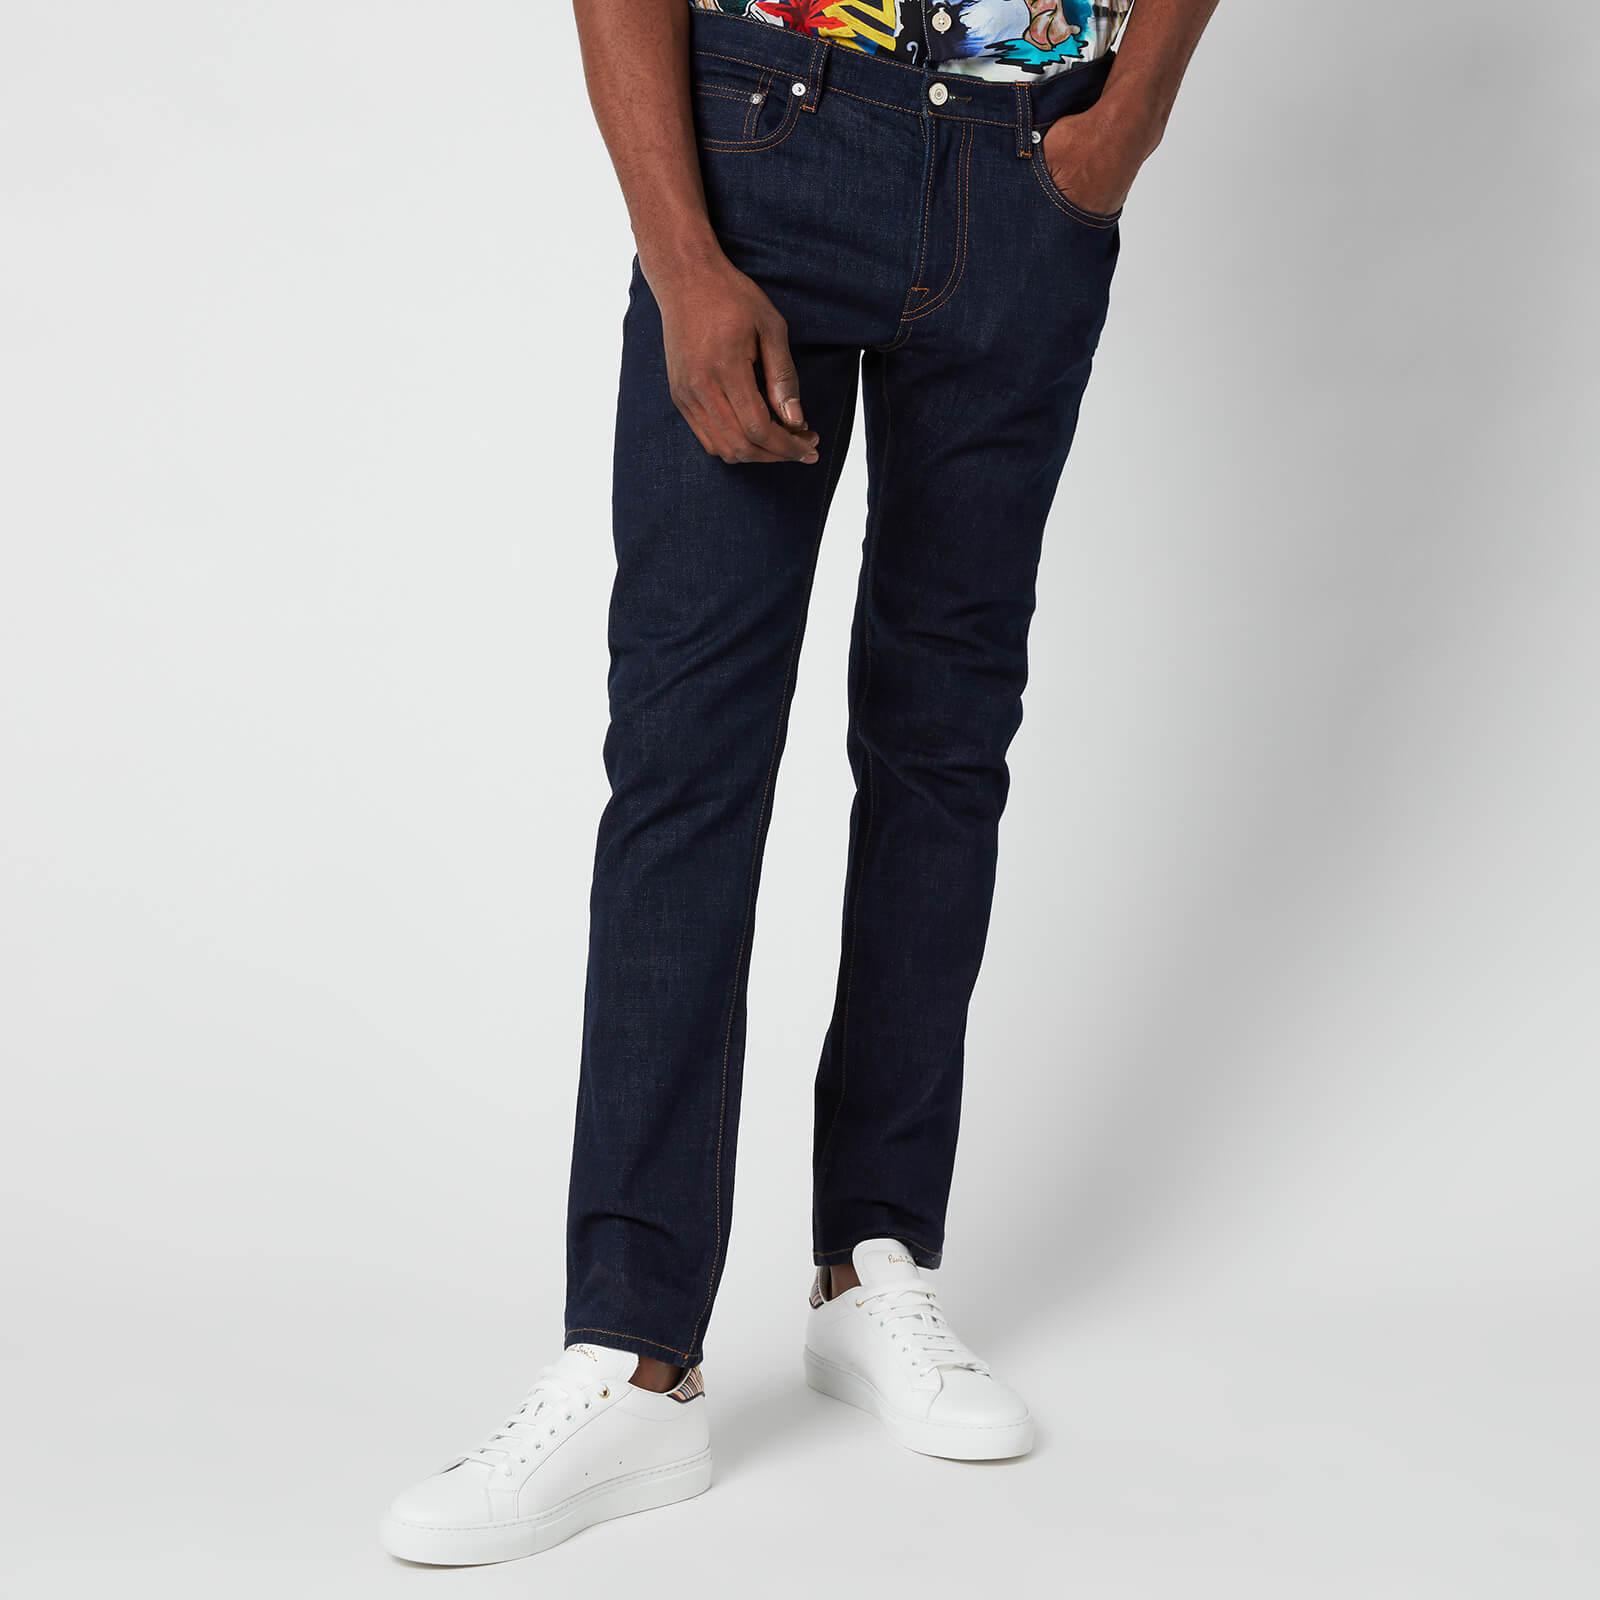 Ps Paul Smith Men's Slim Fit Regular Jeans - Blue - W30